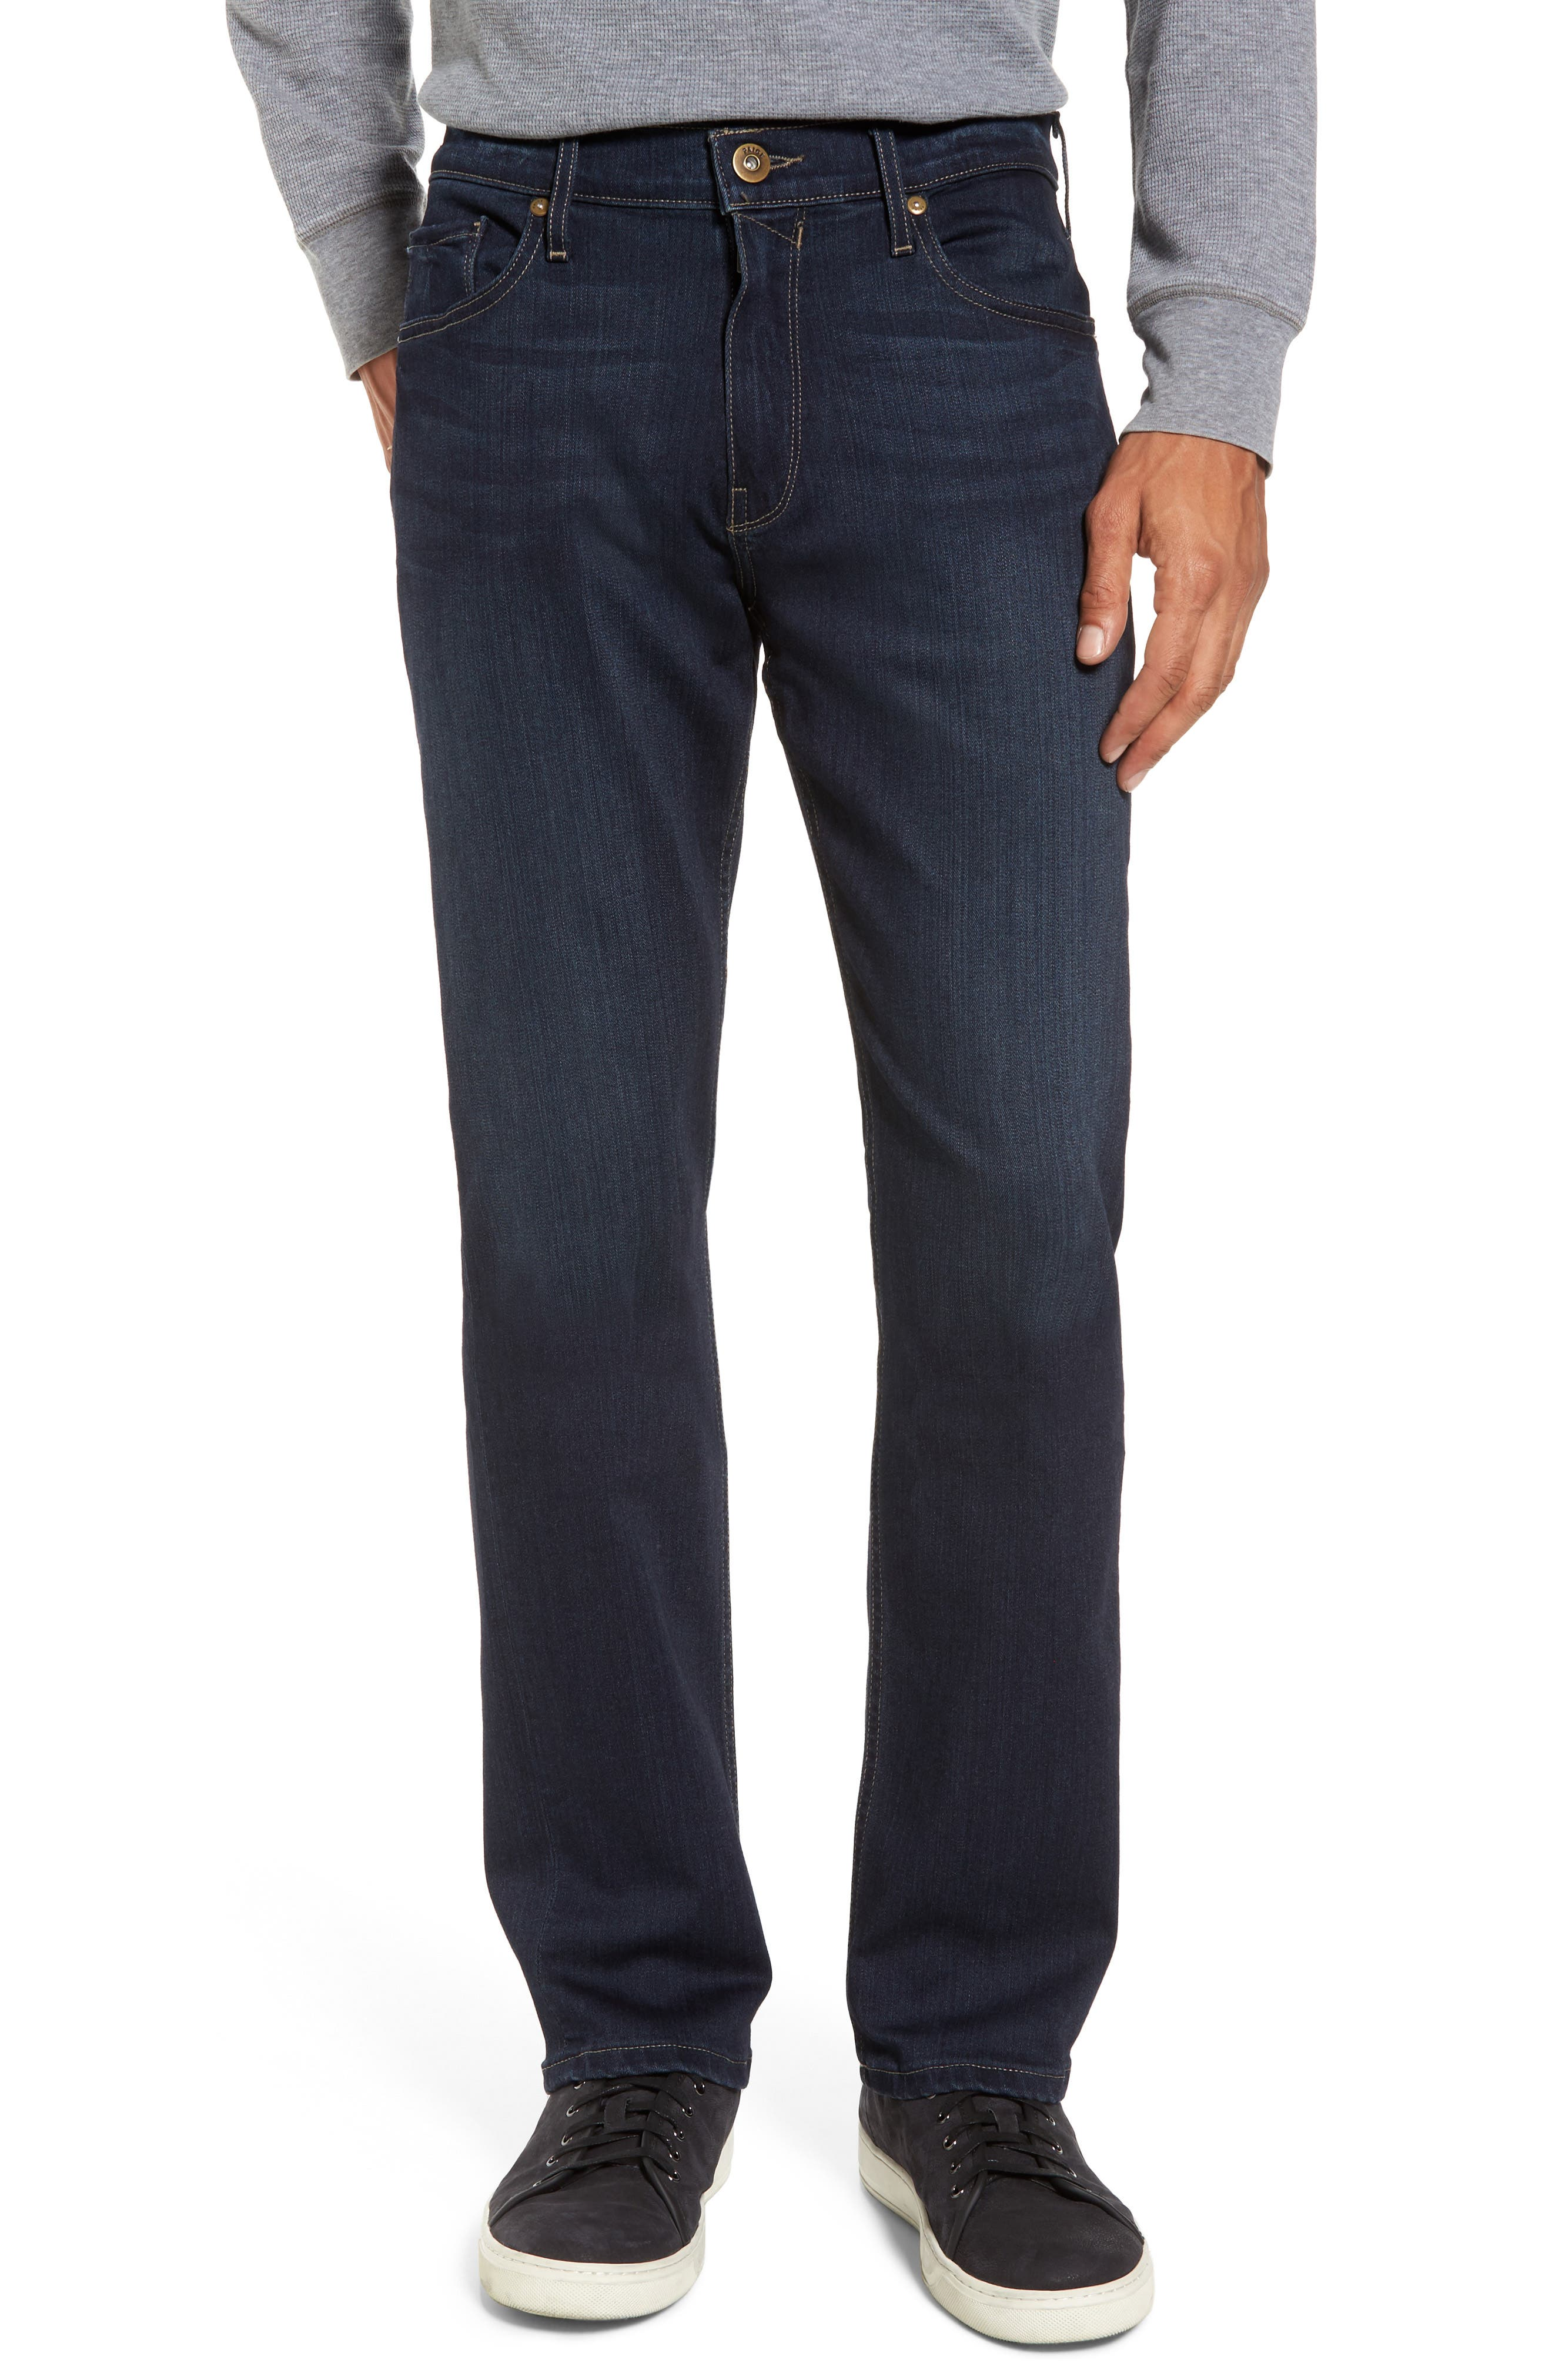 Transcend - Normandie Straight Fit Jeans,                             Main thumbnail 1, color,